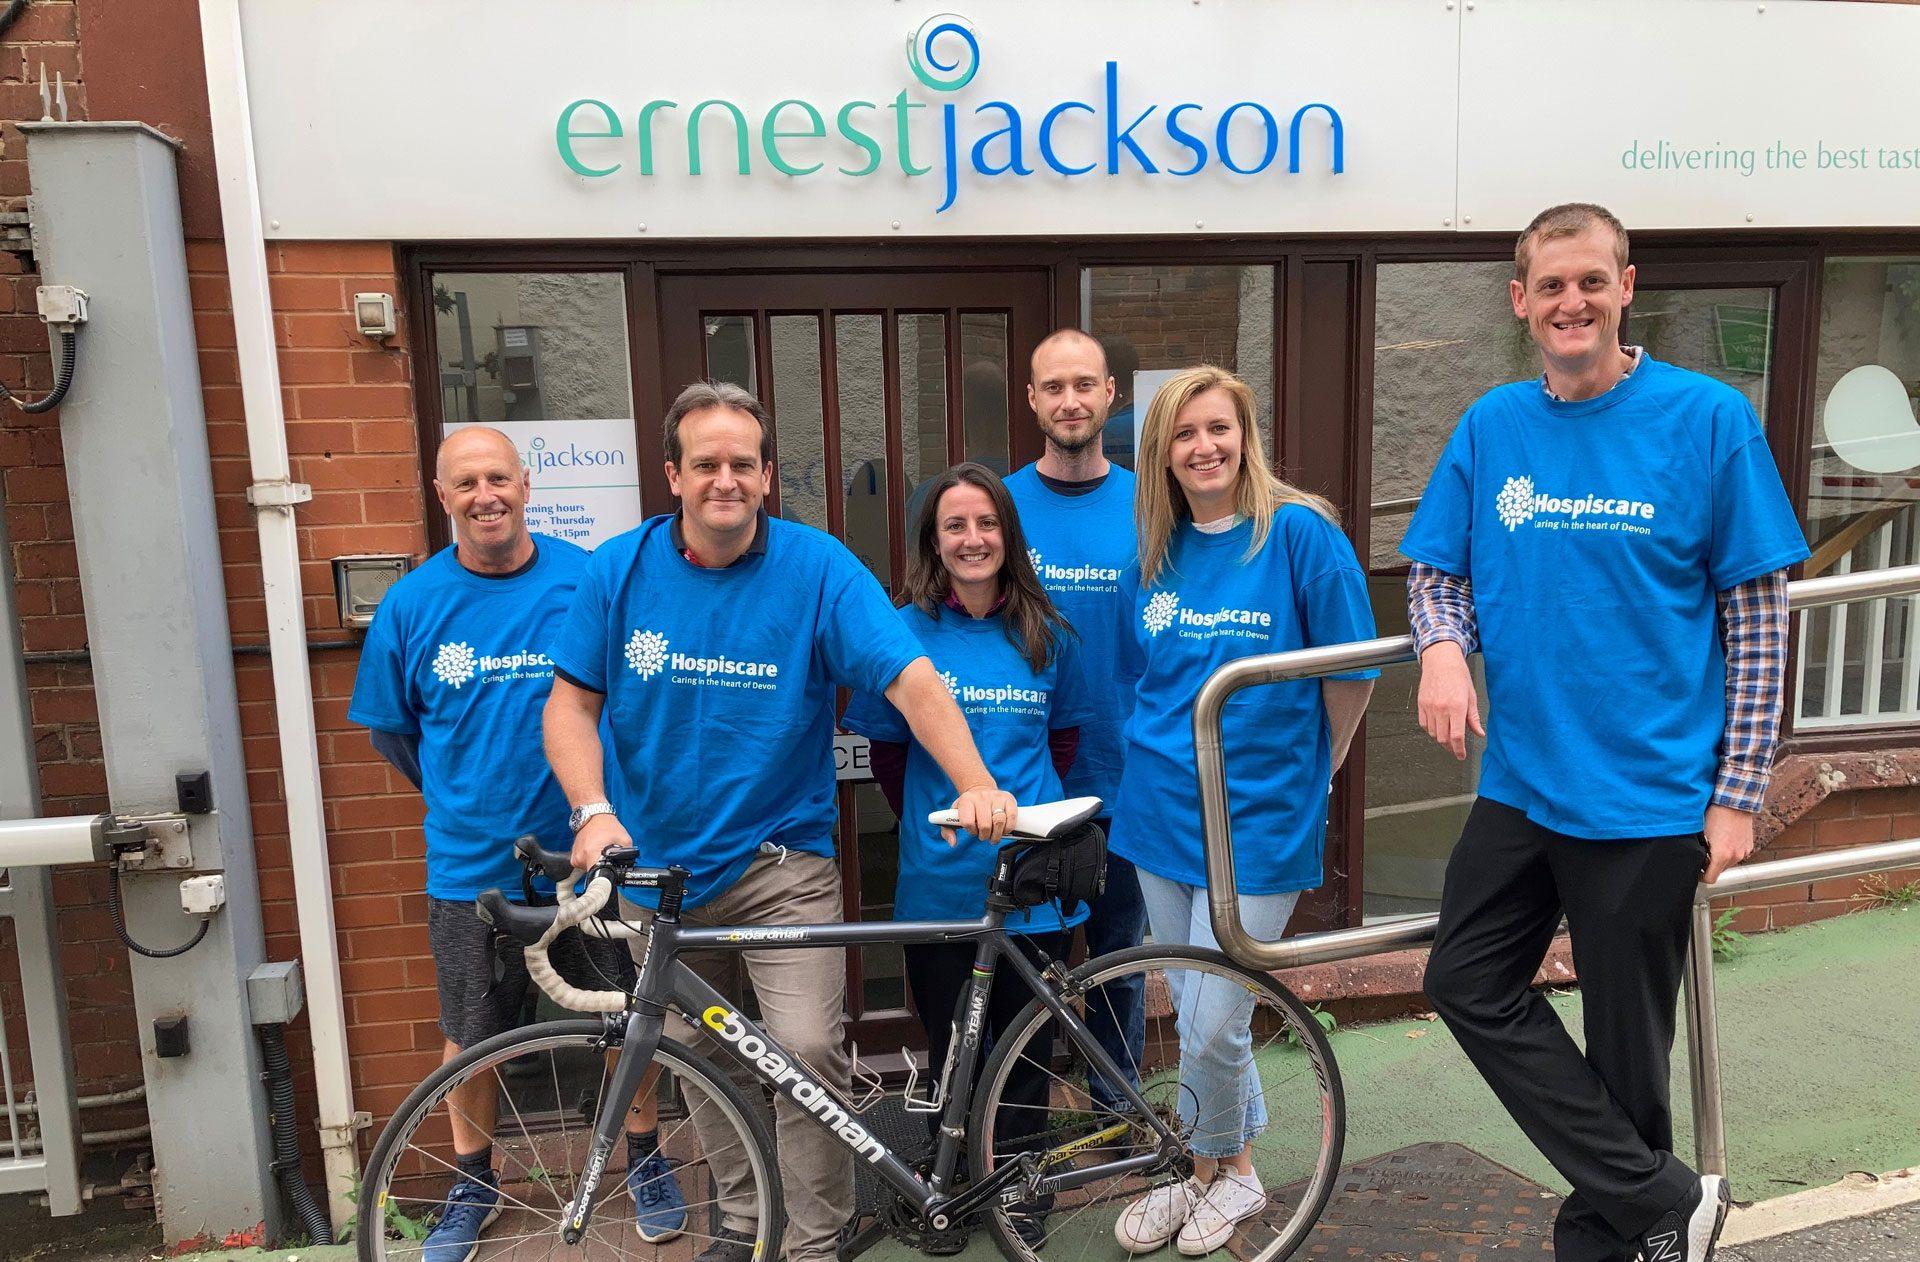 Tour de Devon sponsor Ernest Jackson are determined to go the distance for Hospiscare